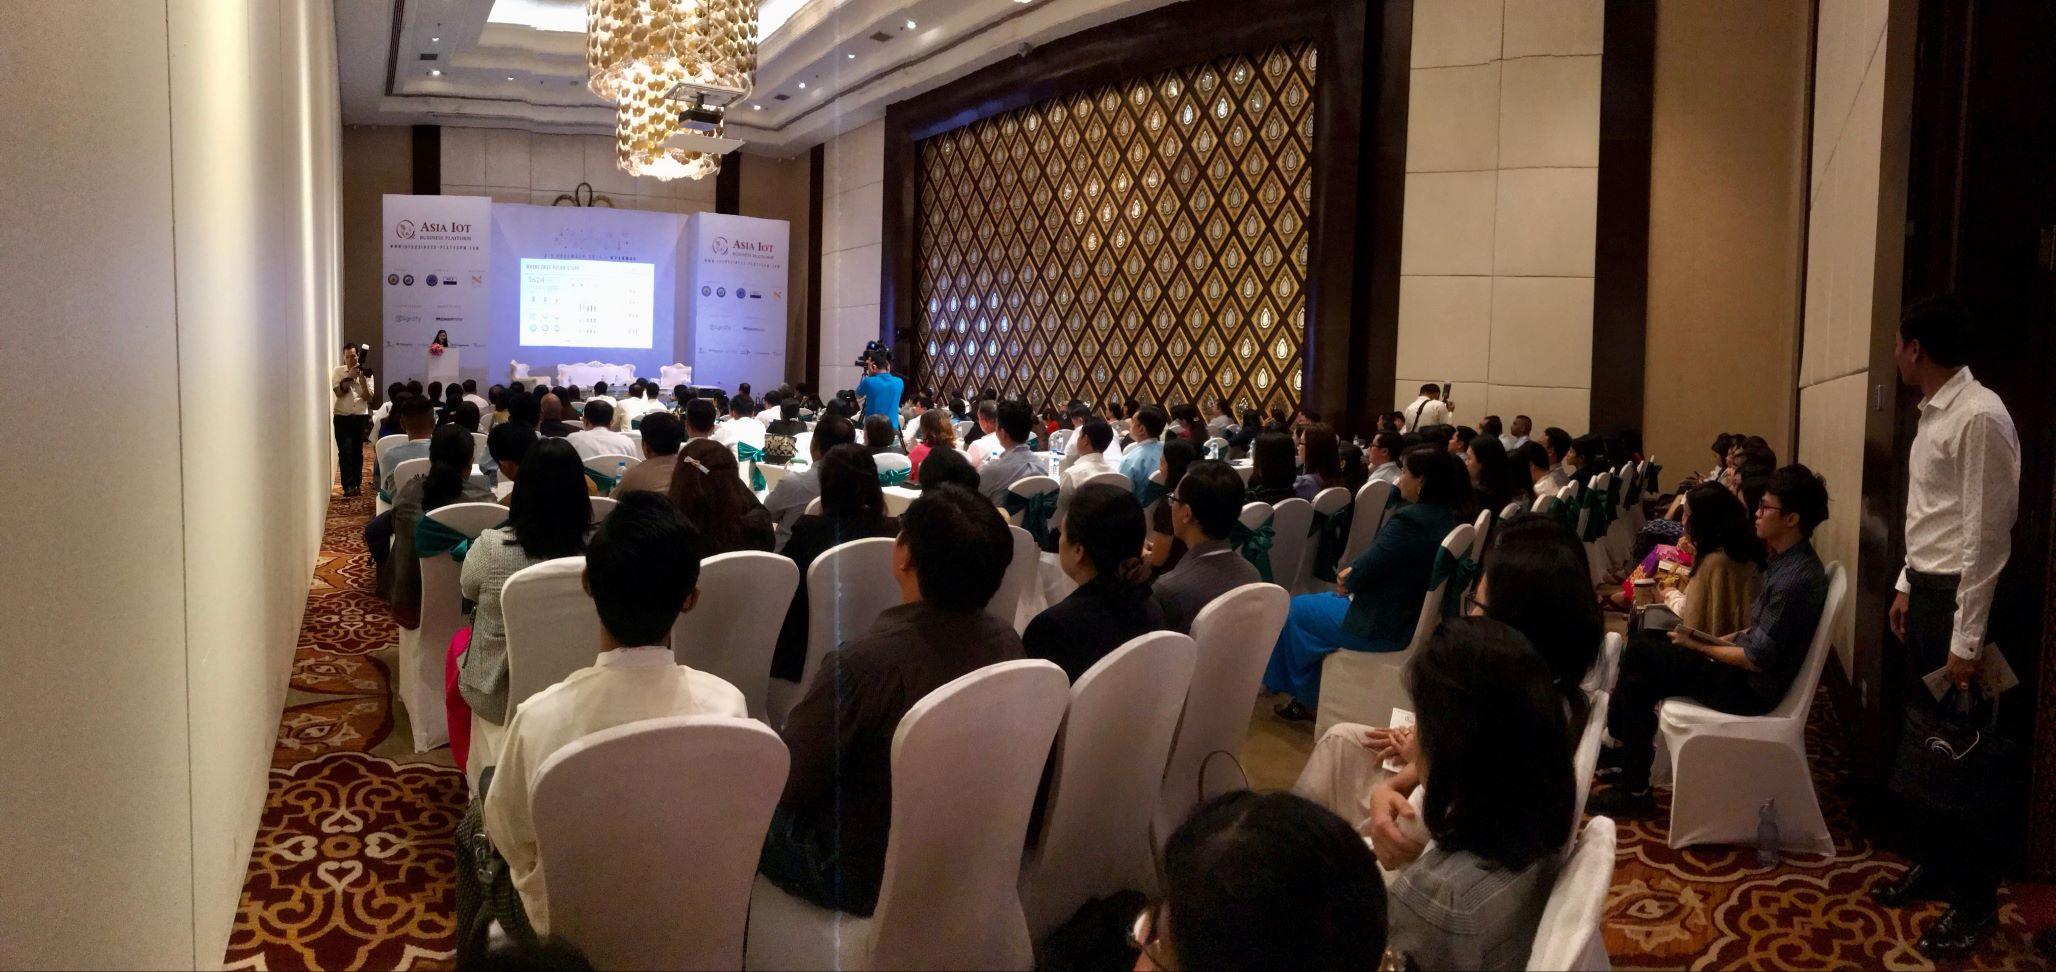 Burning enthusiasms of Digitalization in Myanmar